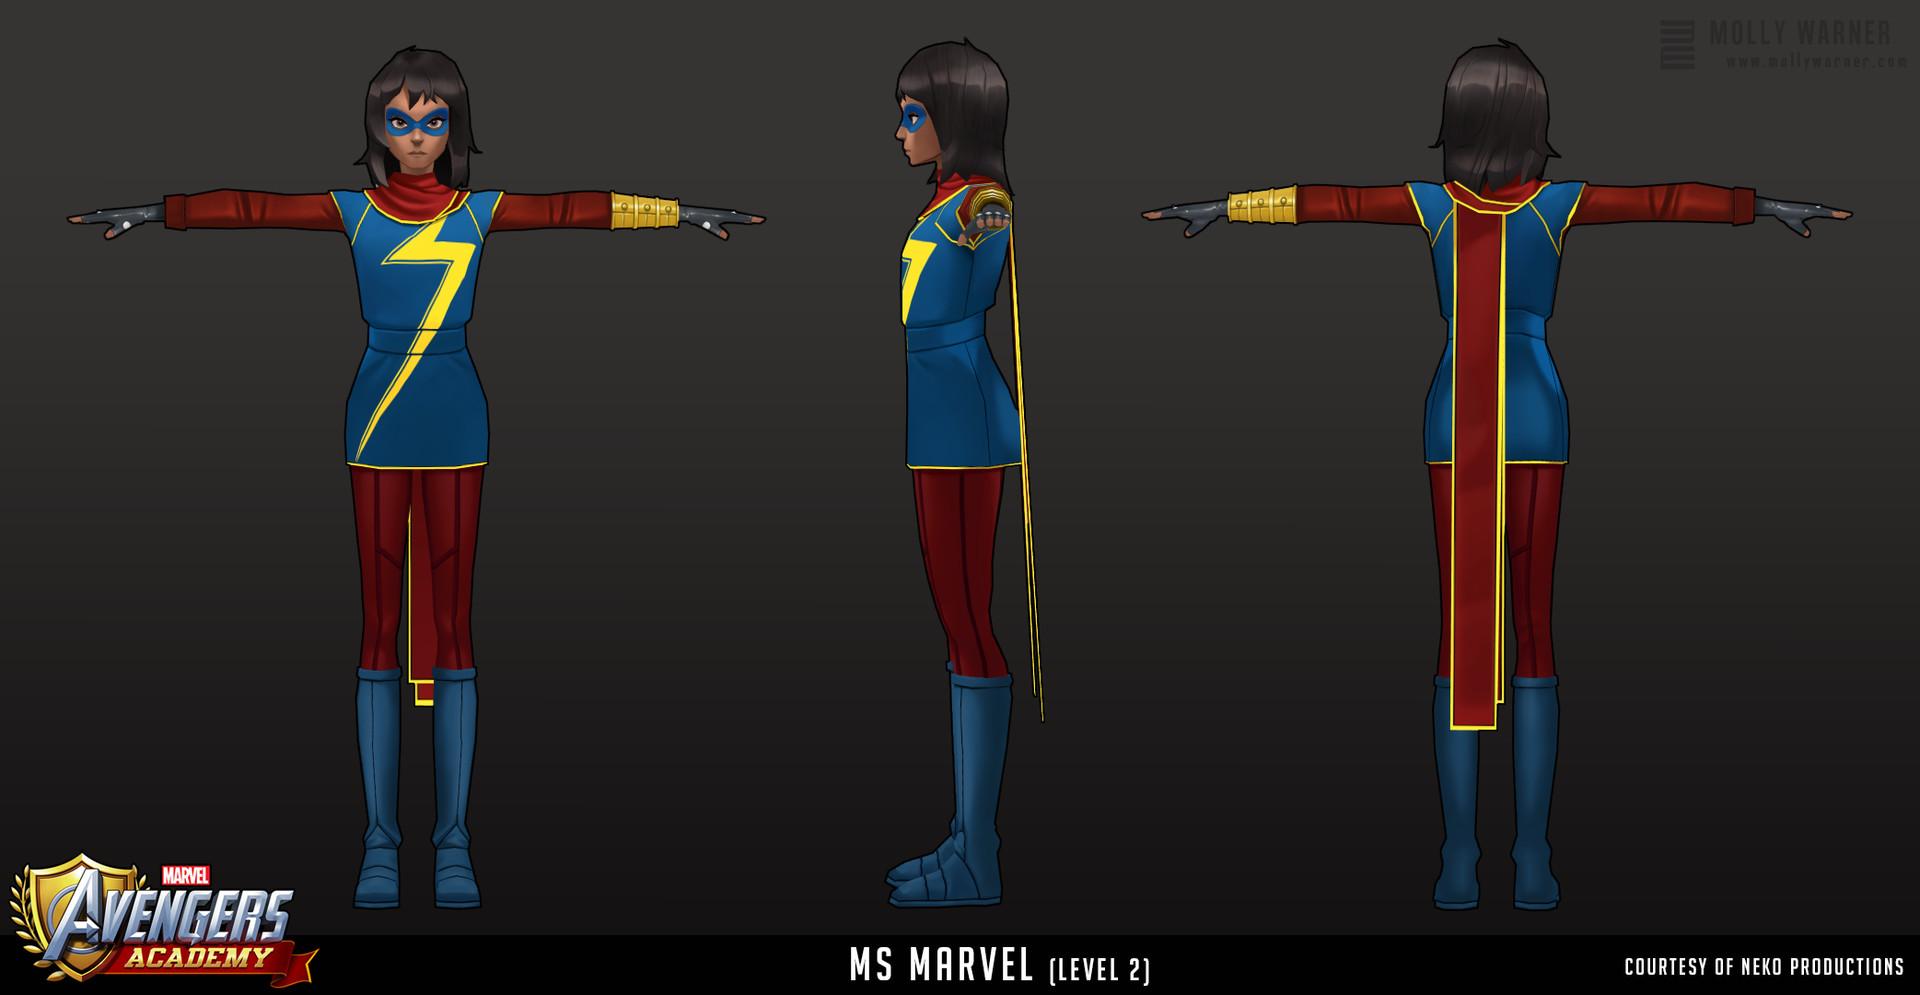 Molly warner 11 avengers academy msmarvel l2